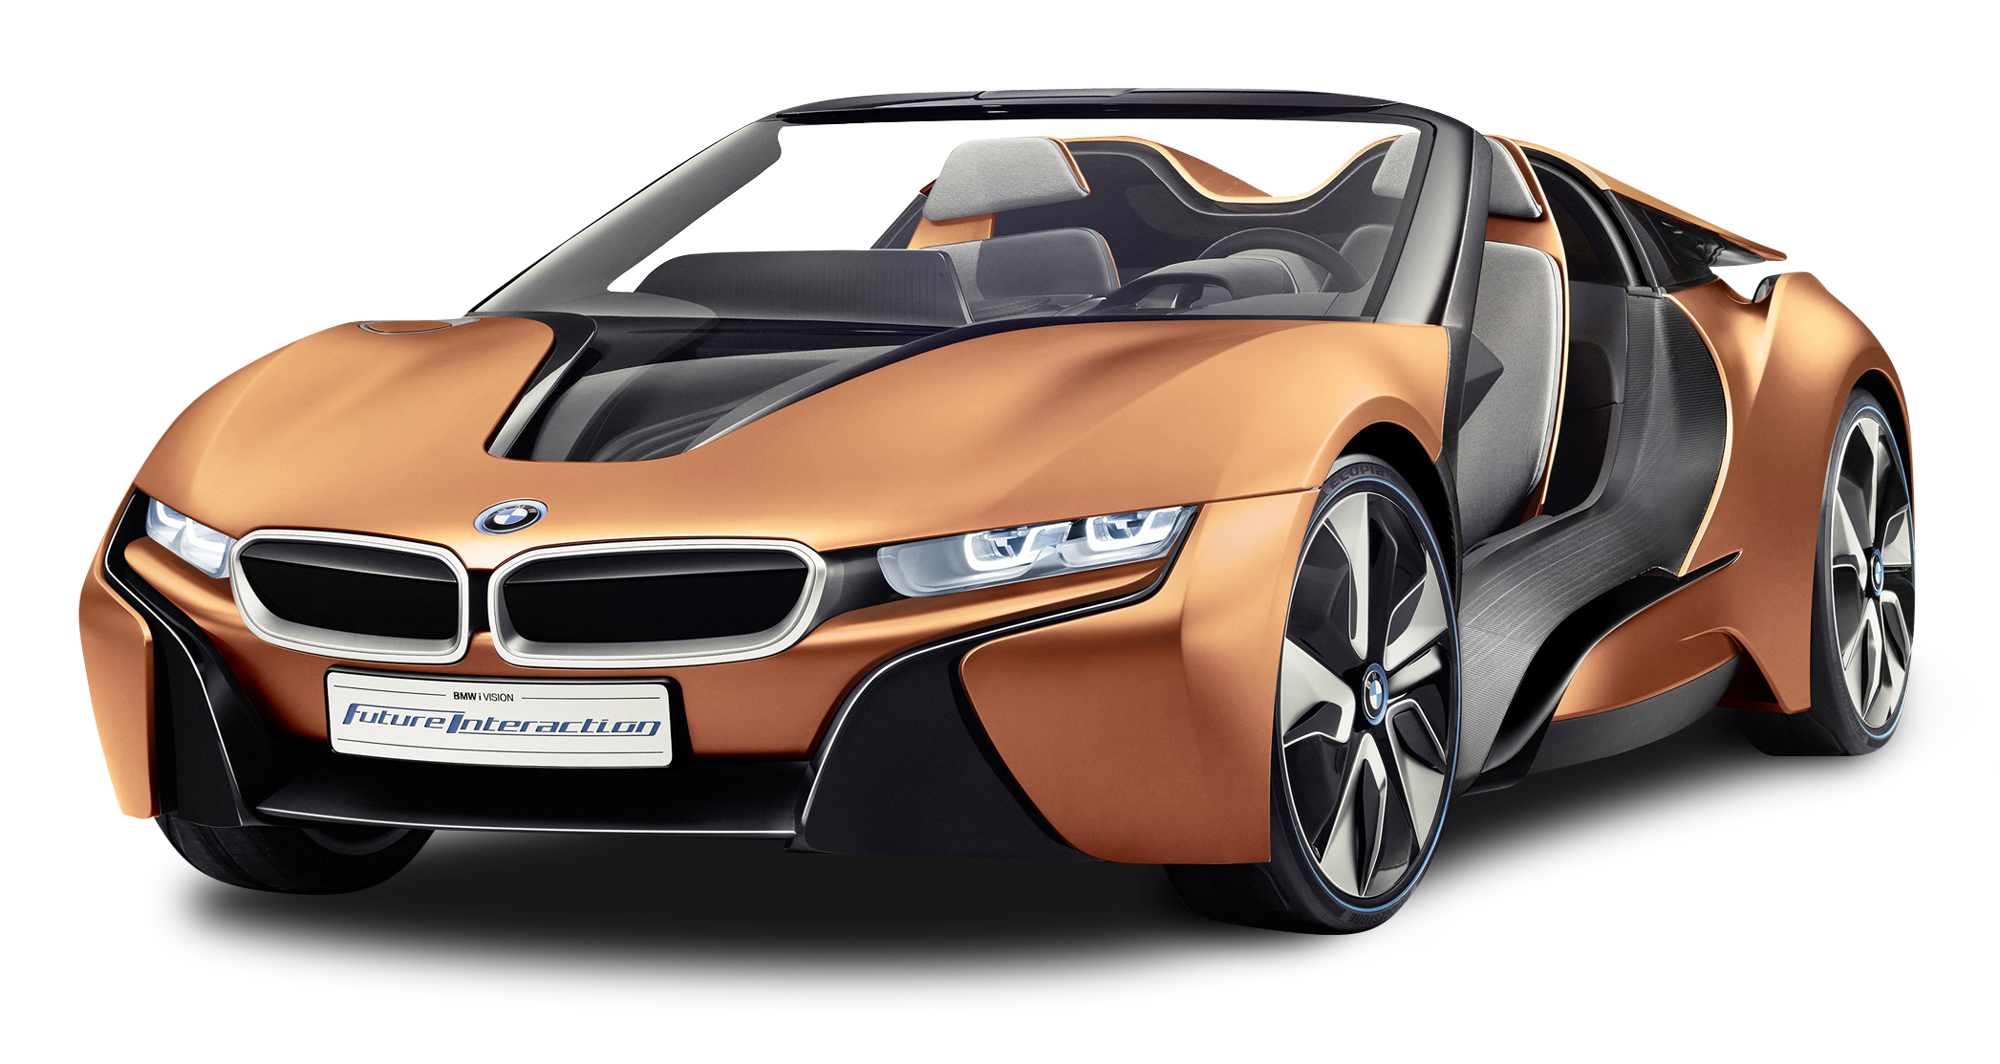 Orange Bmw I8 Spyder Car Png Image Purepng Free Transparent Cc0